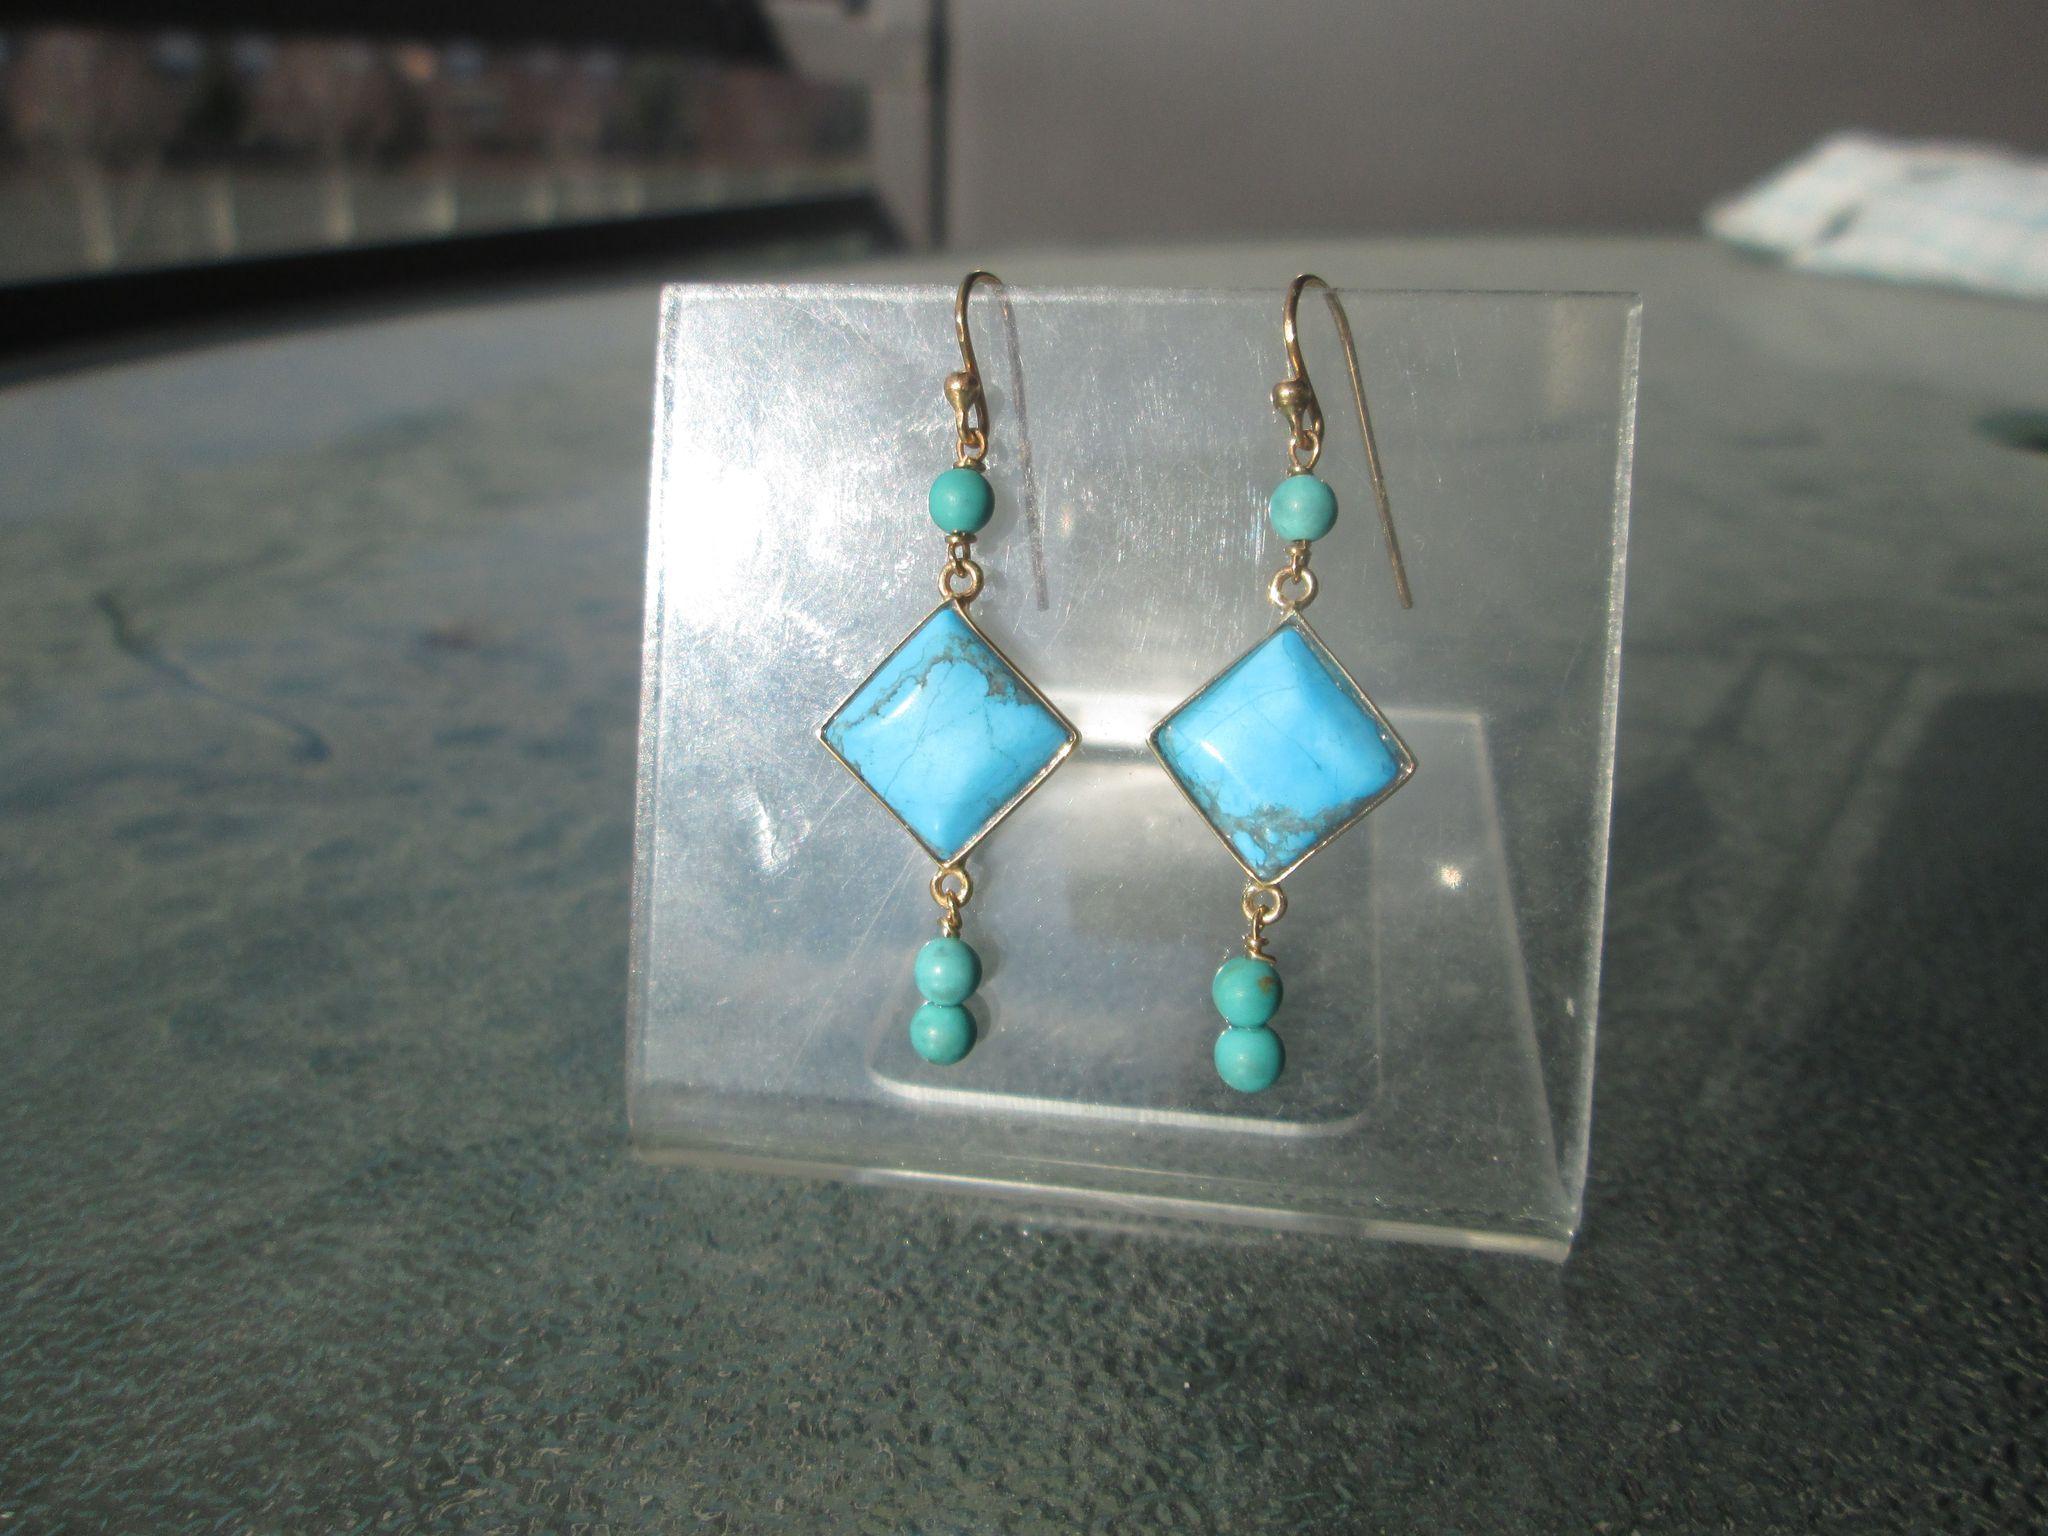 9kt Yellow Gold Diamond Shape Turquoise and Turquoise Bead Dangle Earrings